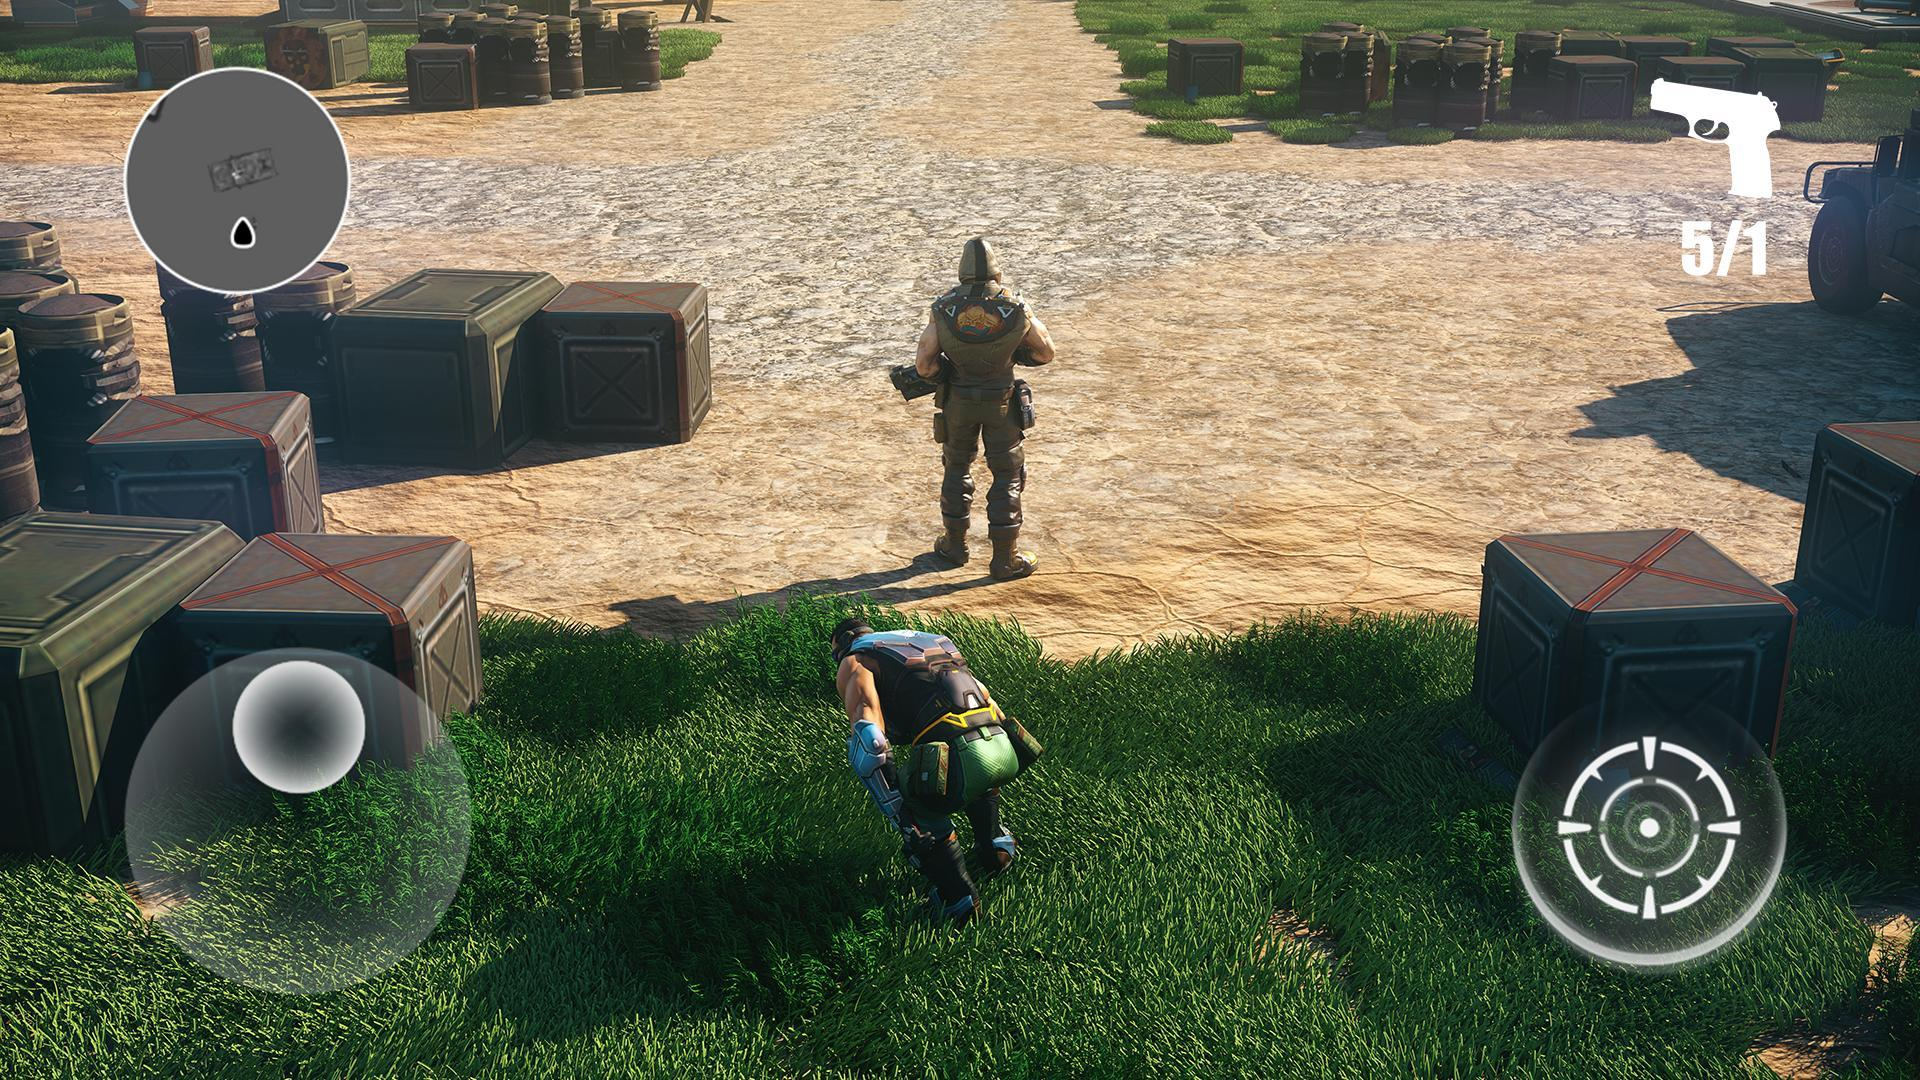 Evolution 2 Battle for Utopia. Action games 0.580.78866 Screenshot 20